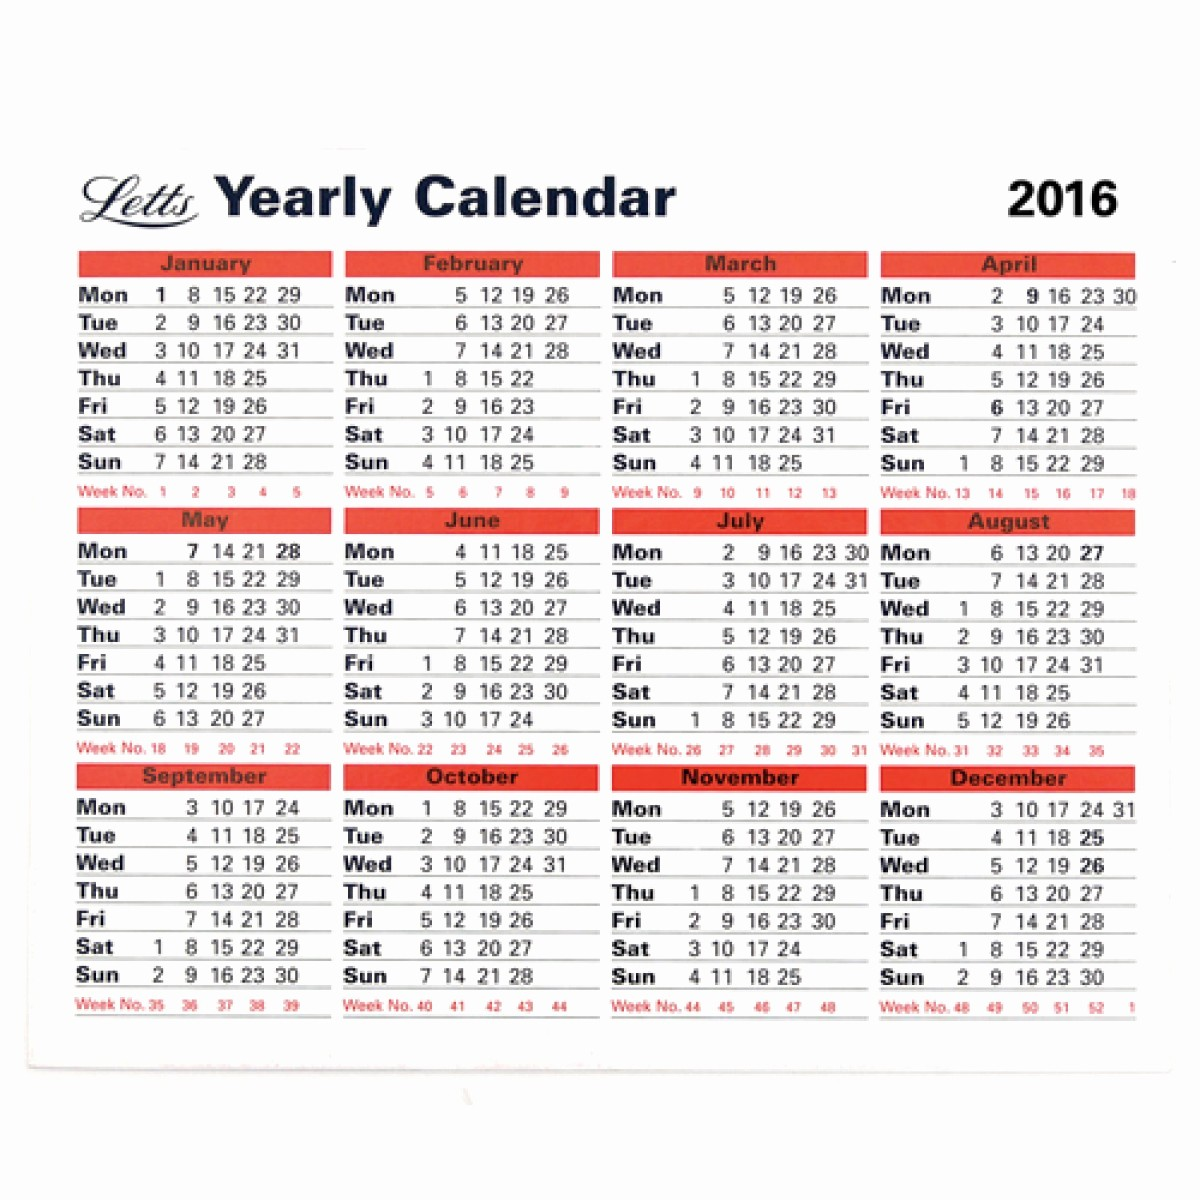 5 Year Calendar Starting 2016 New Letts Yearly Calendar 2016 5 Tyc Loco